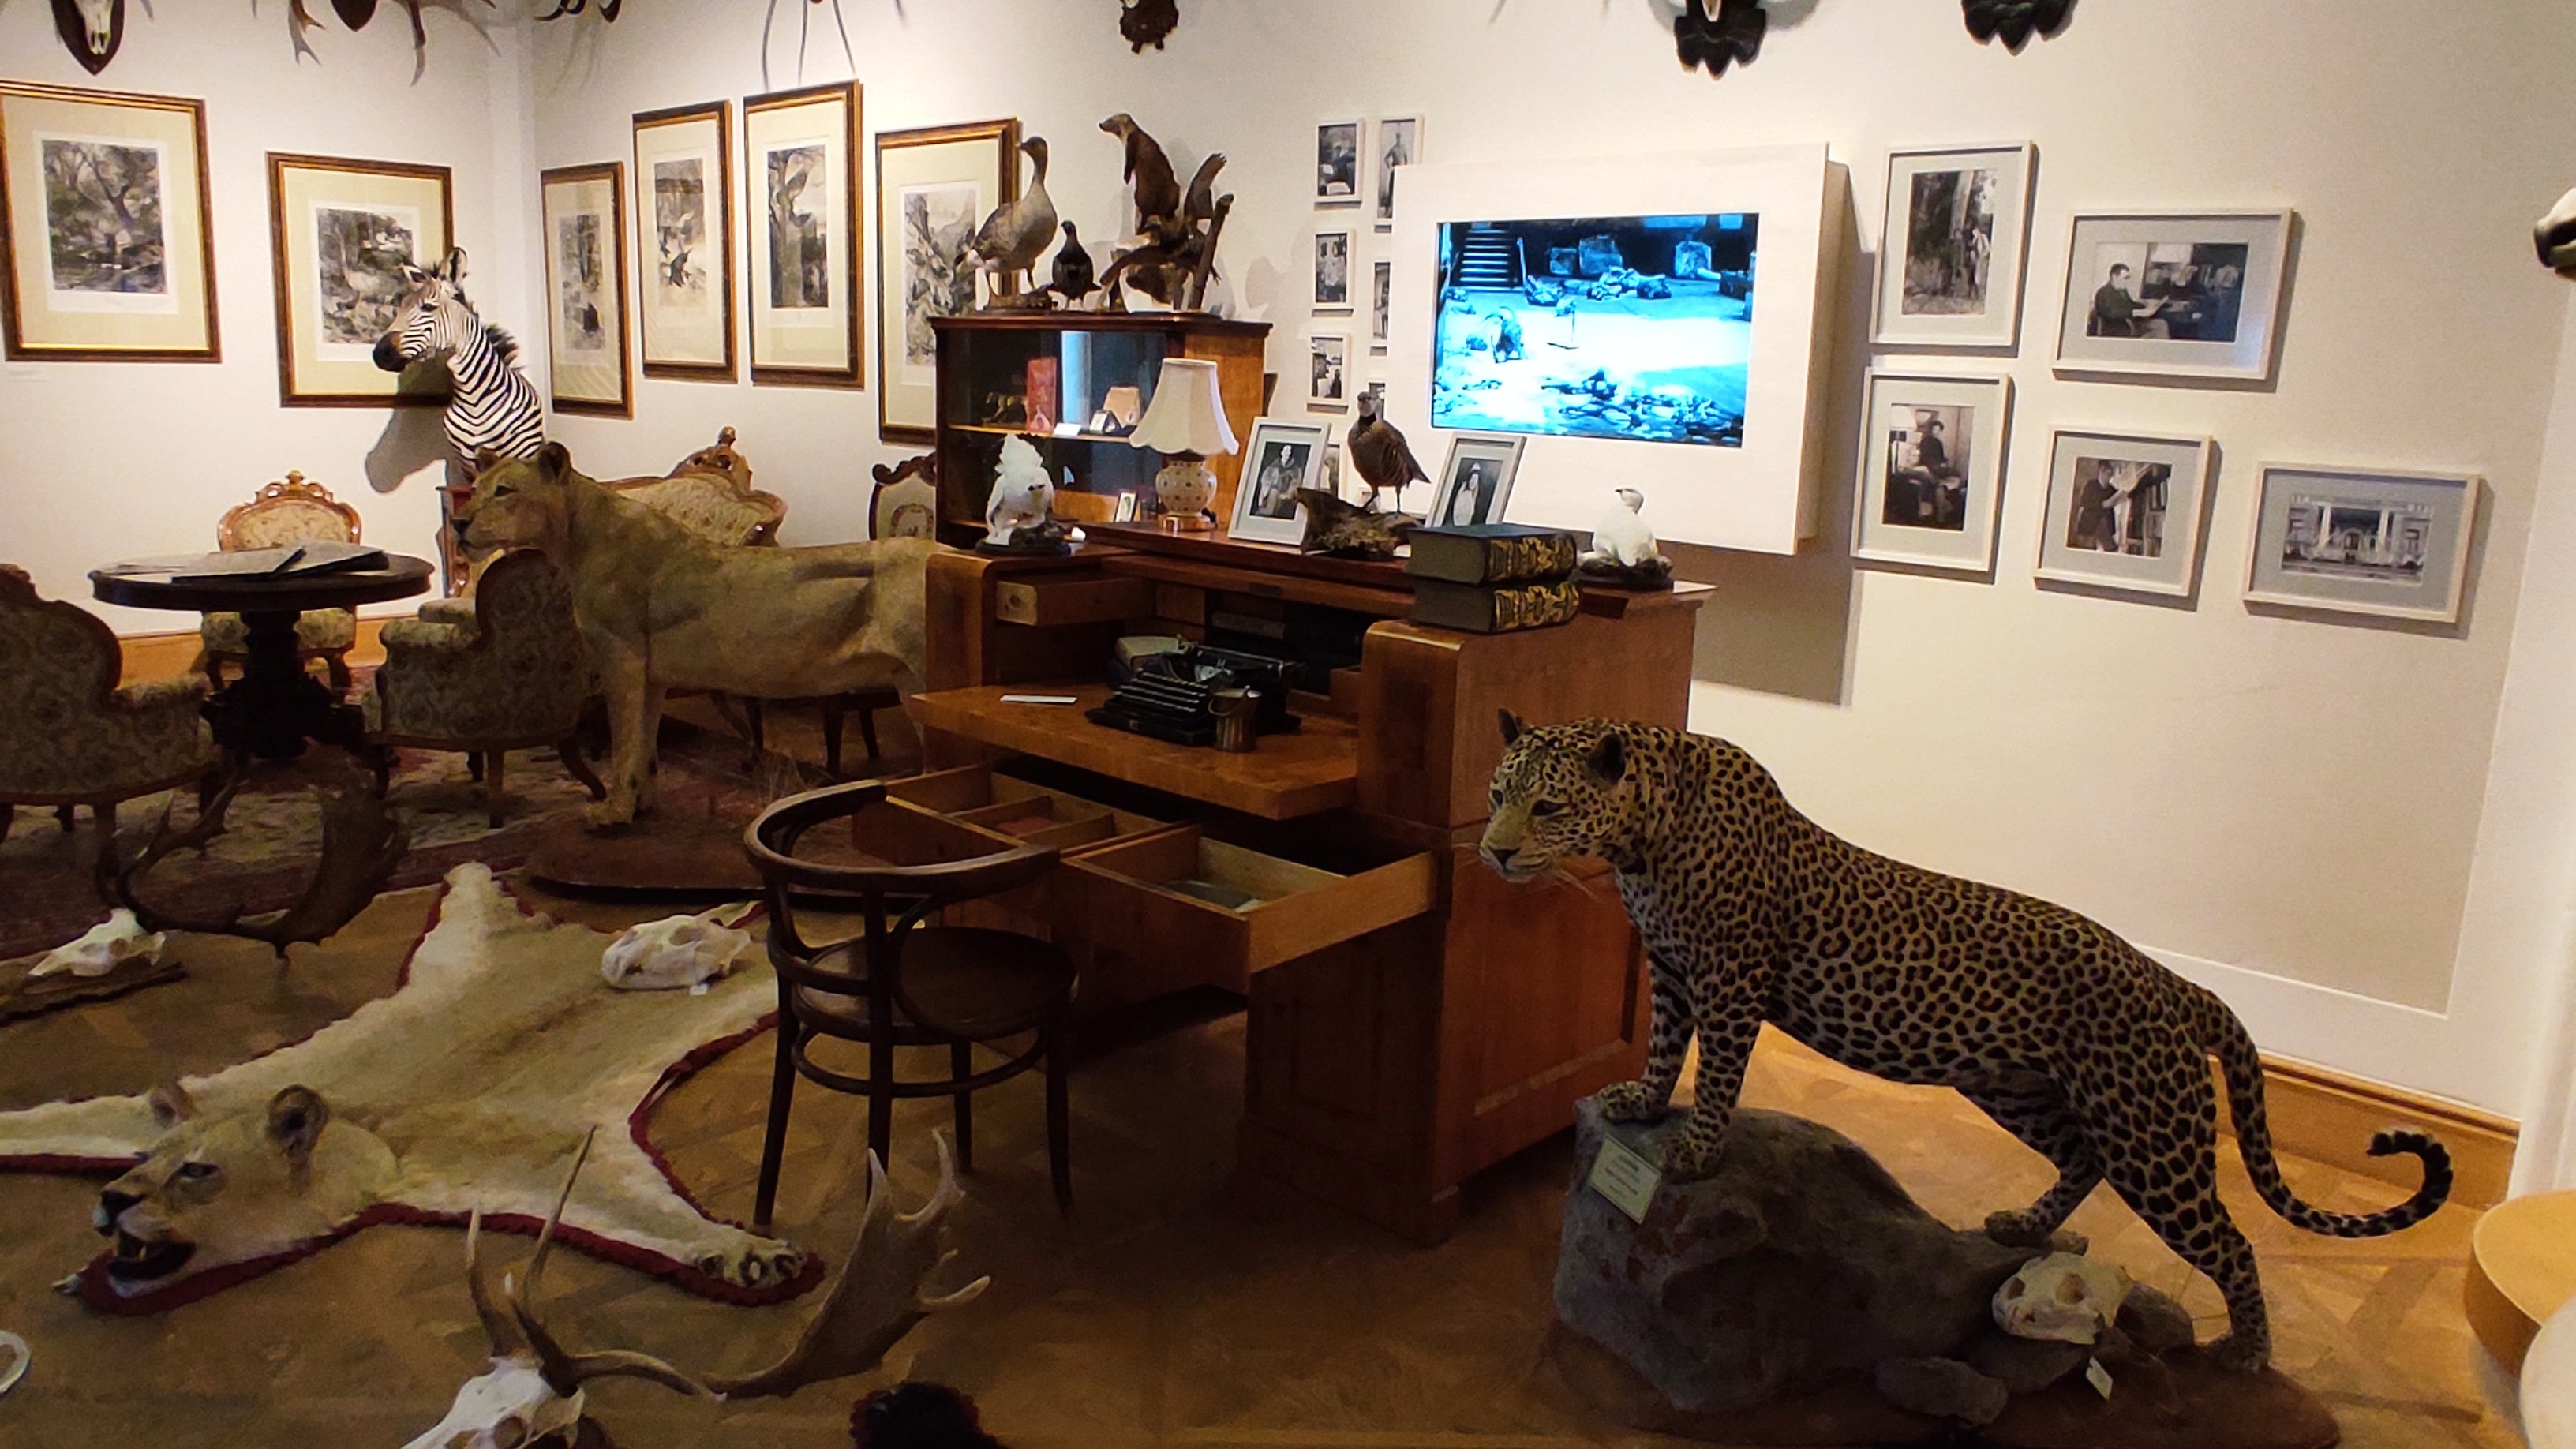 Kirandulastervezo-Hatvan-Vadaszati-Muzeum-11.jpg